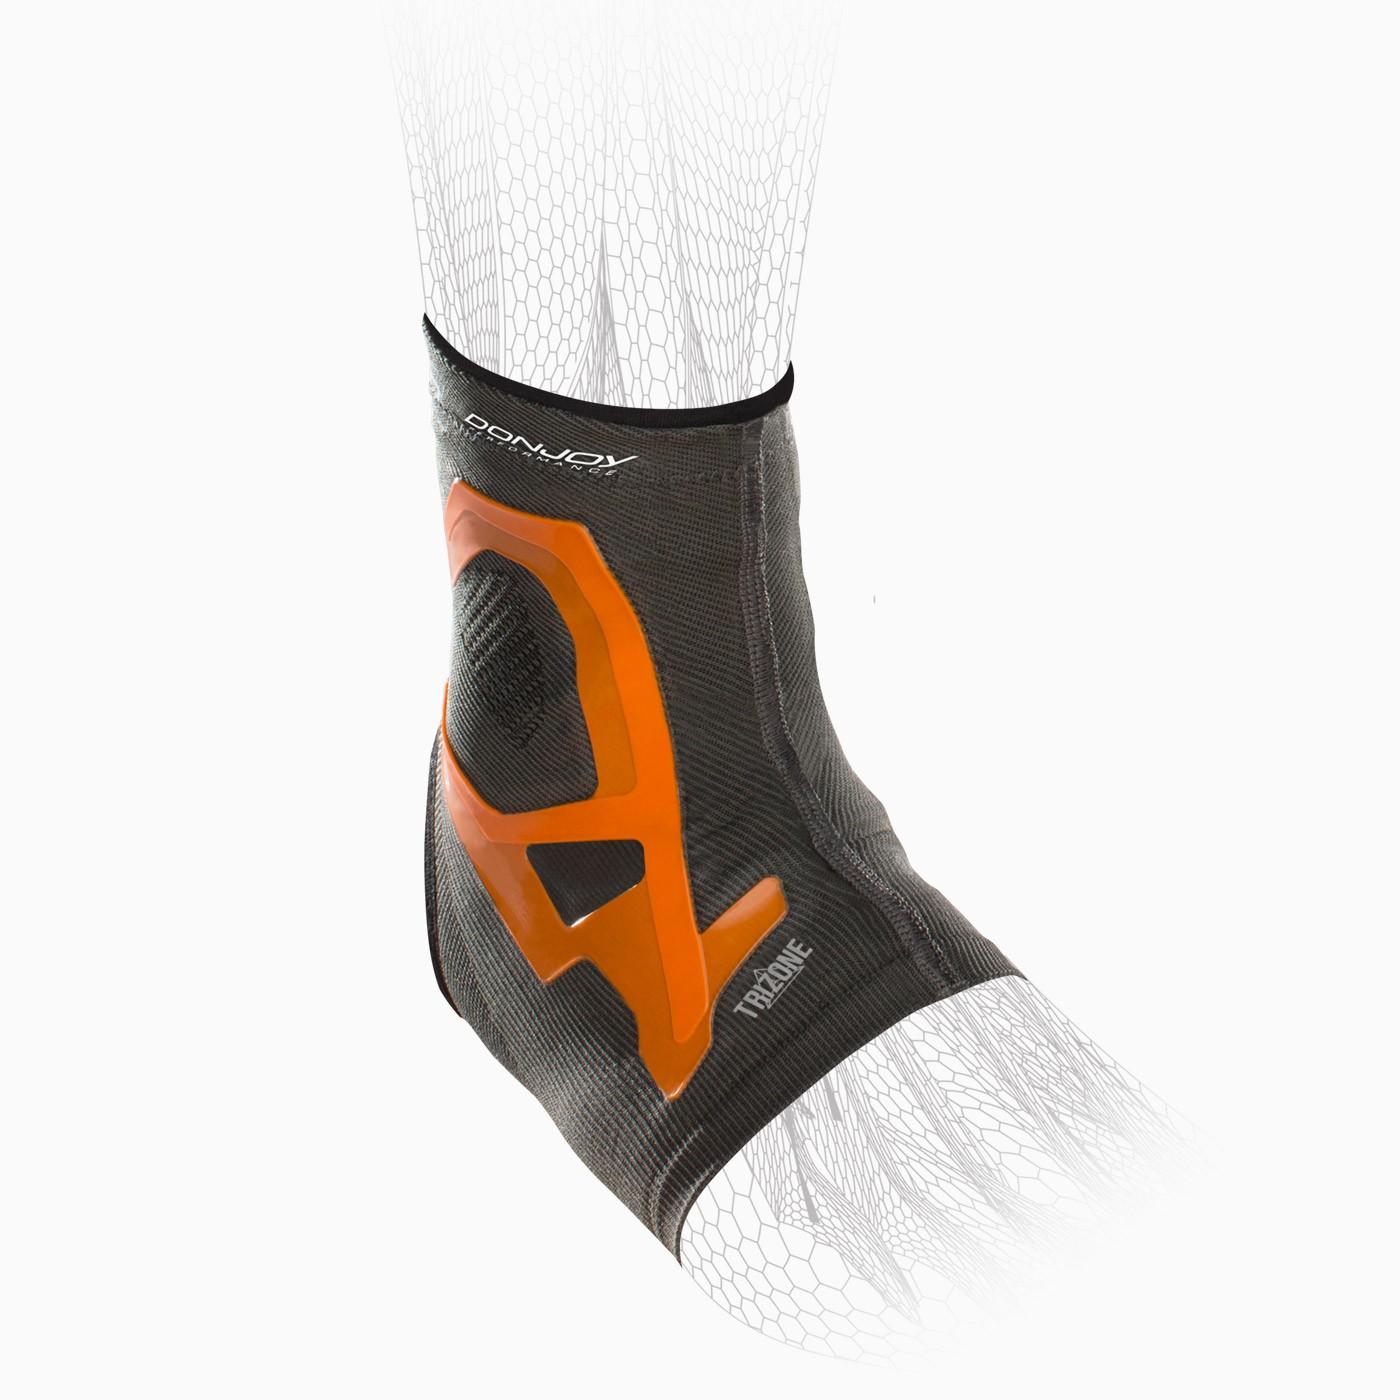 fc8d81df714b DonJoy Performance. Trizone Ankle Compression Sleeve